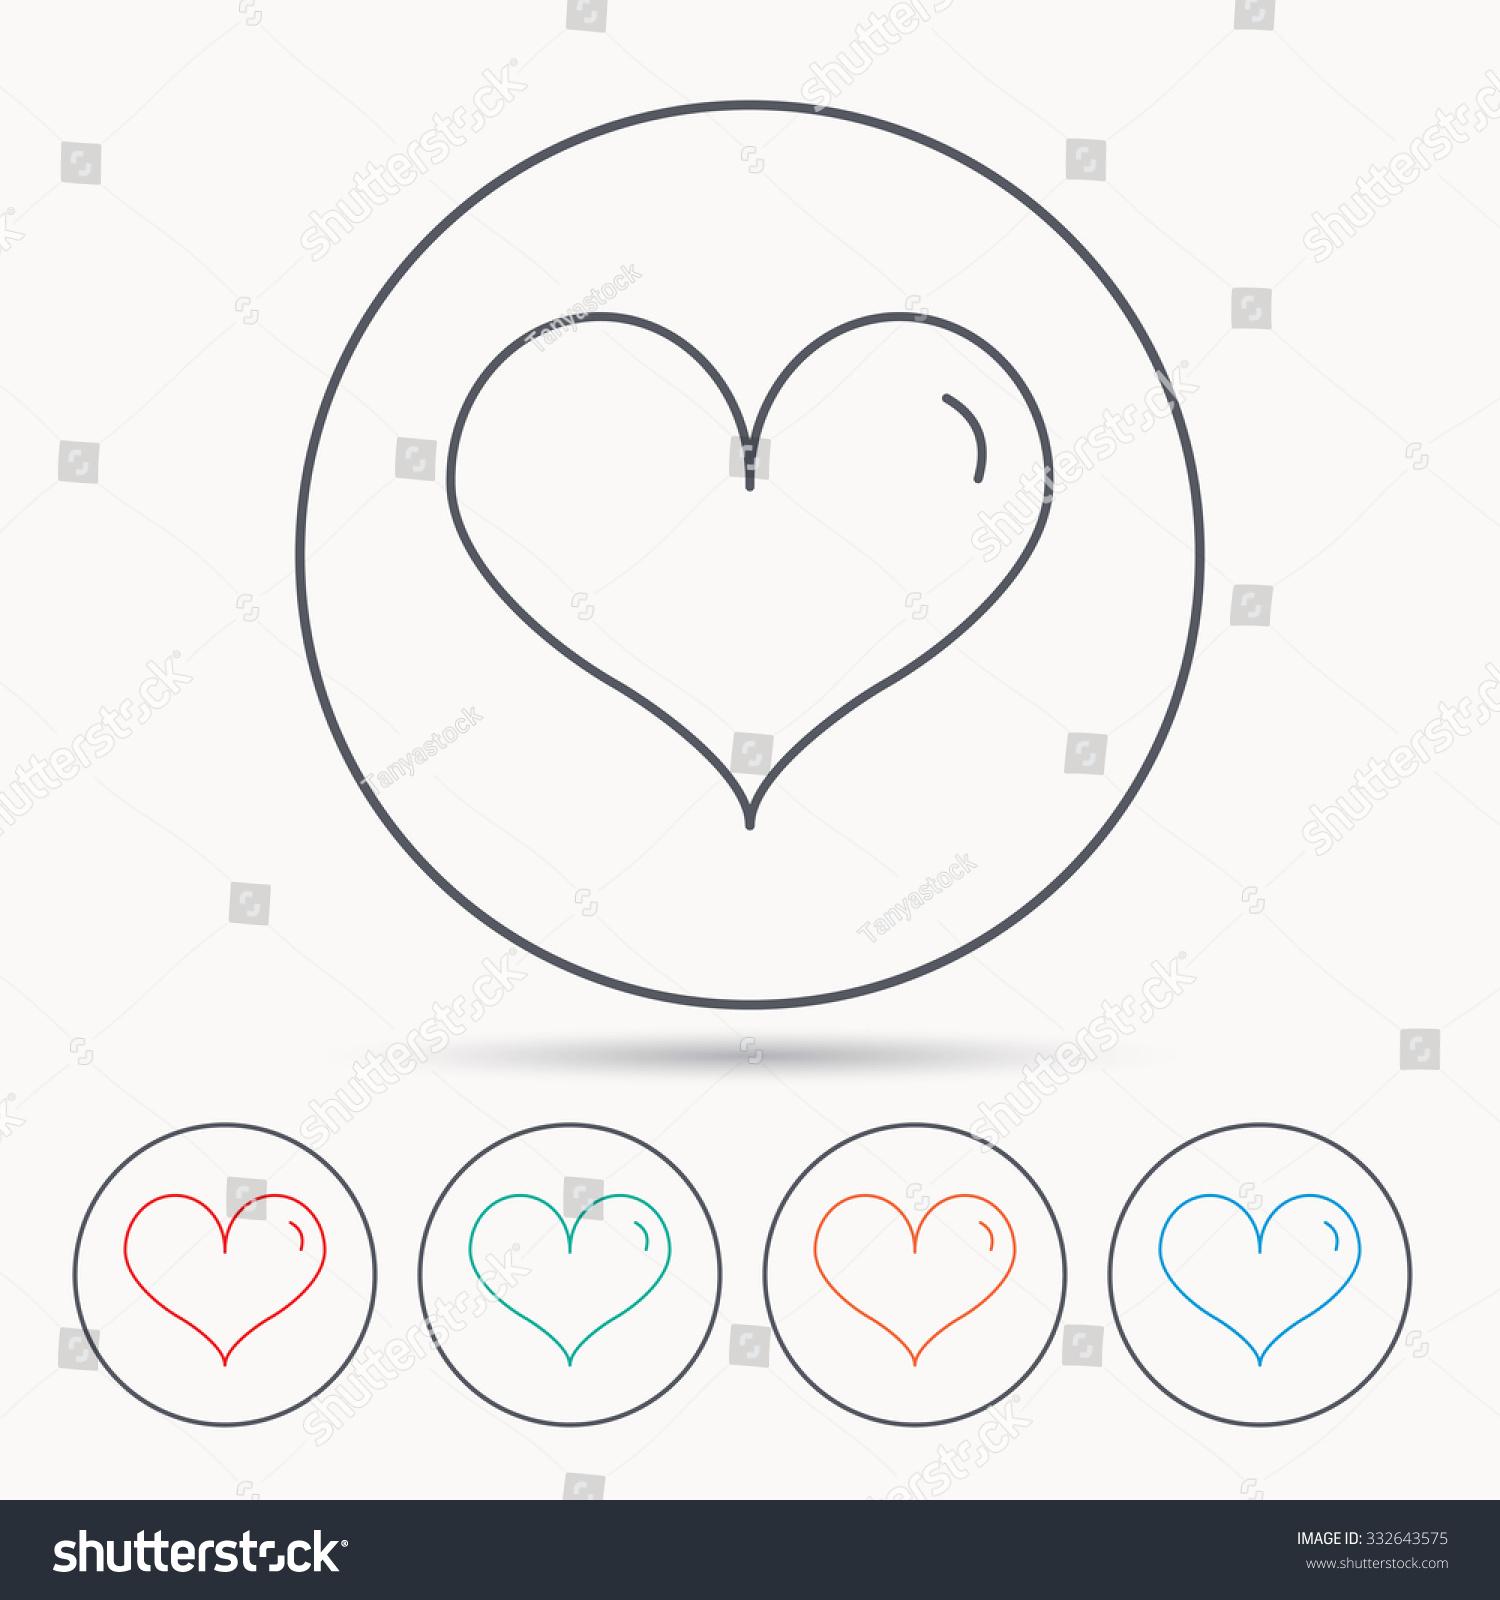 Heart icon love sign life symbol stock vector 332643575 shutterstock love sign life symbol linear circle icons buycottarizona